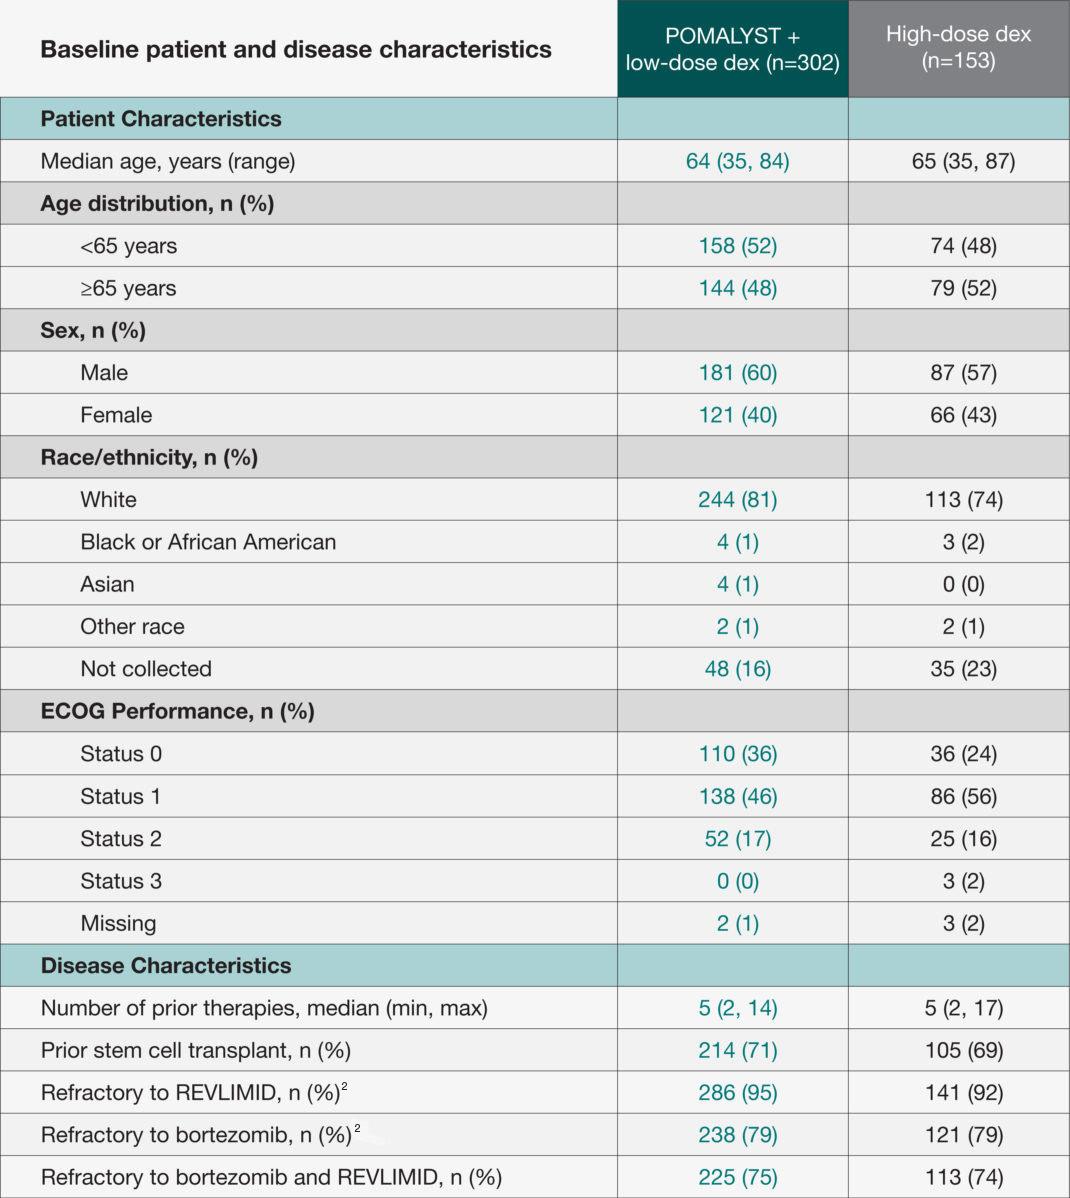 POMALYST® + dexamethasone Phase 3 Trial Baseline Characteristics table